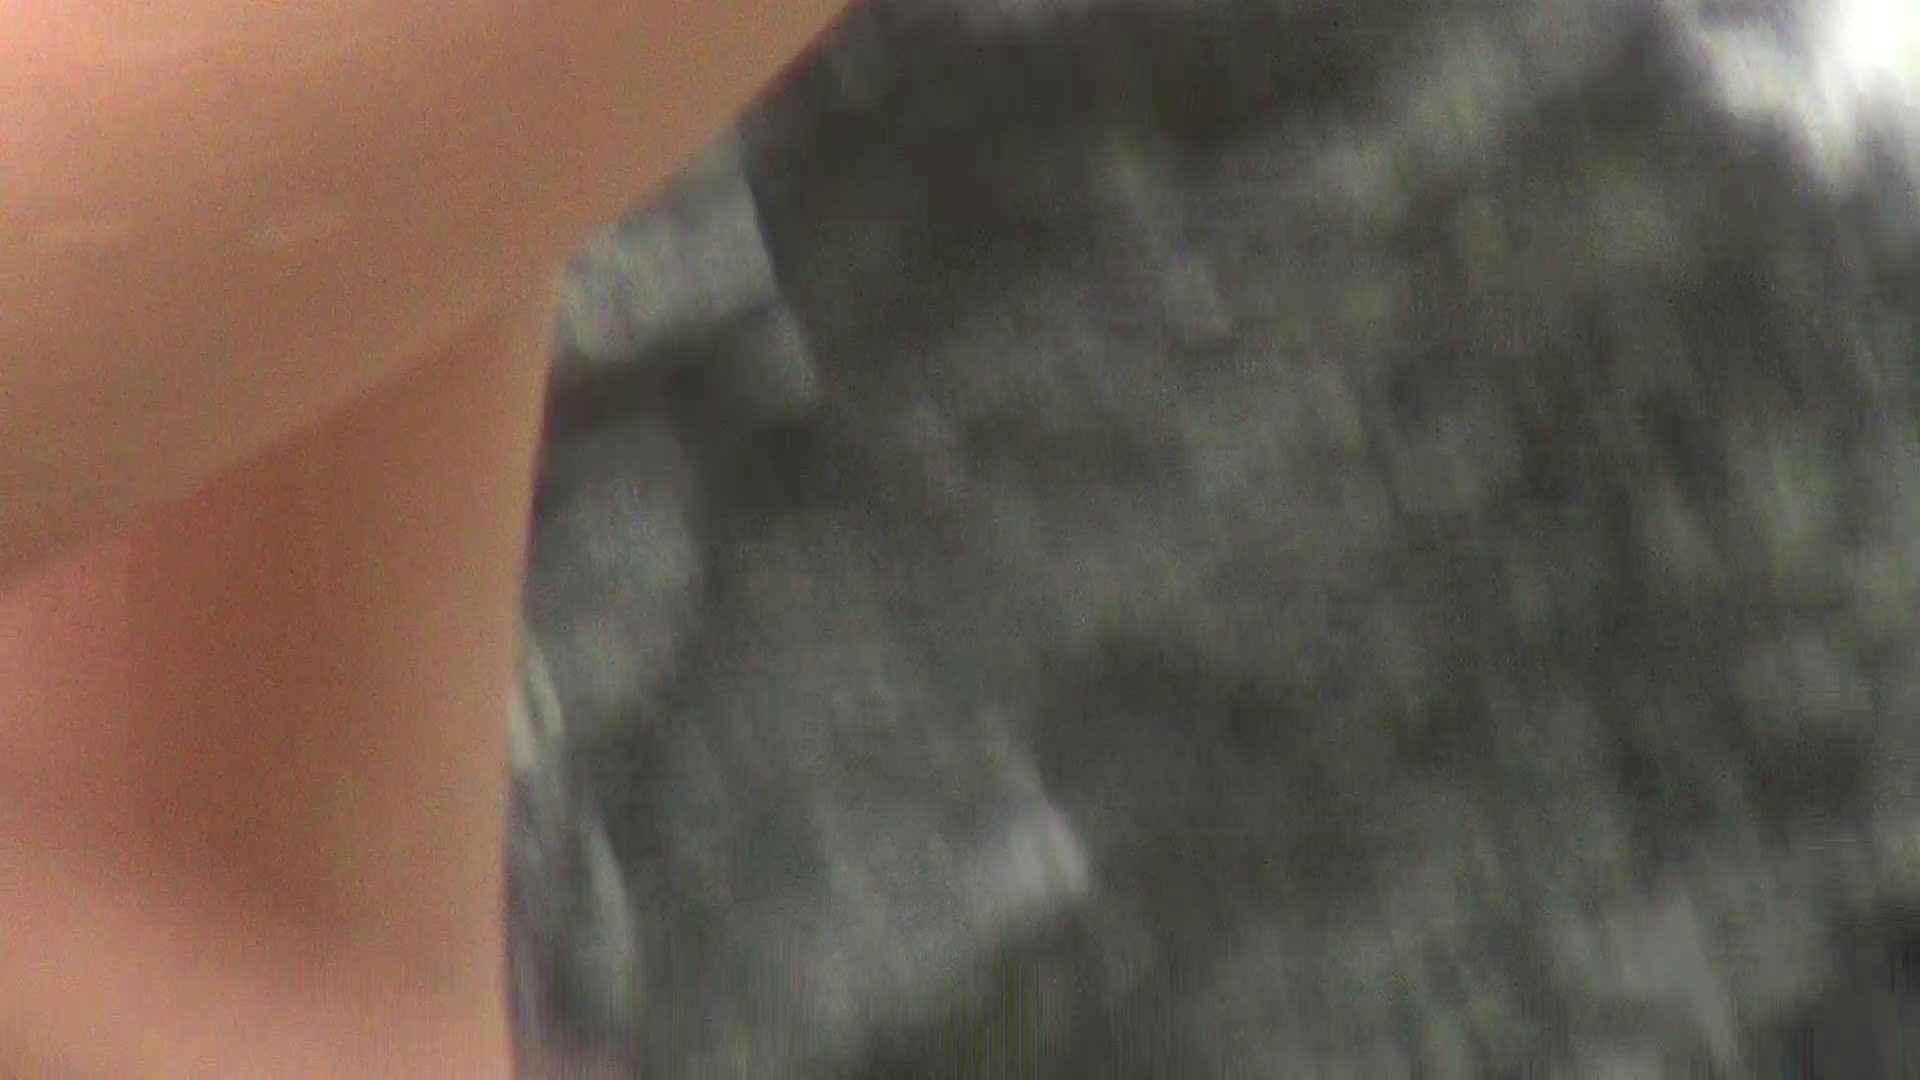 Vol.80 出産経験済みの弛んだ肉体と大胆すぎるアングル 露天丸見え AV無料 87画像 53